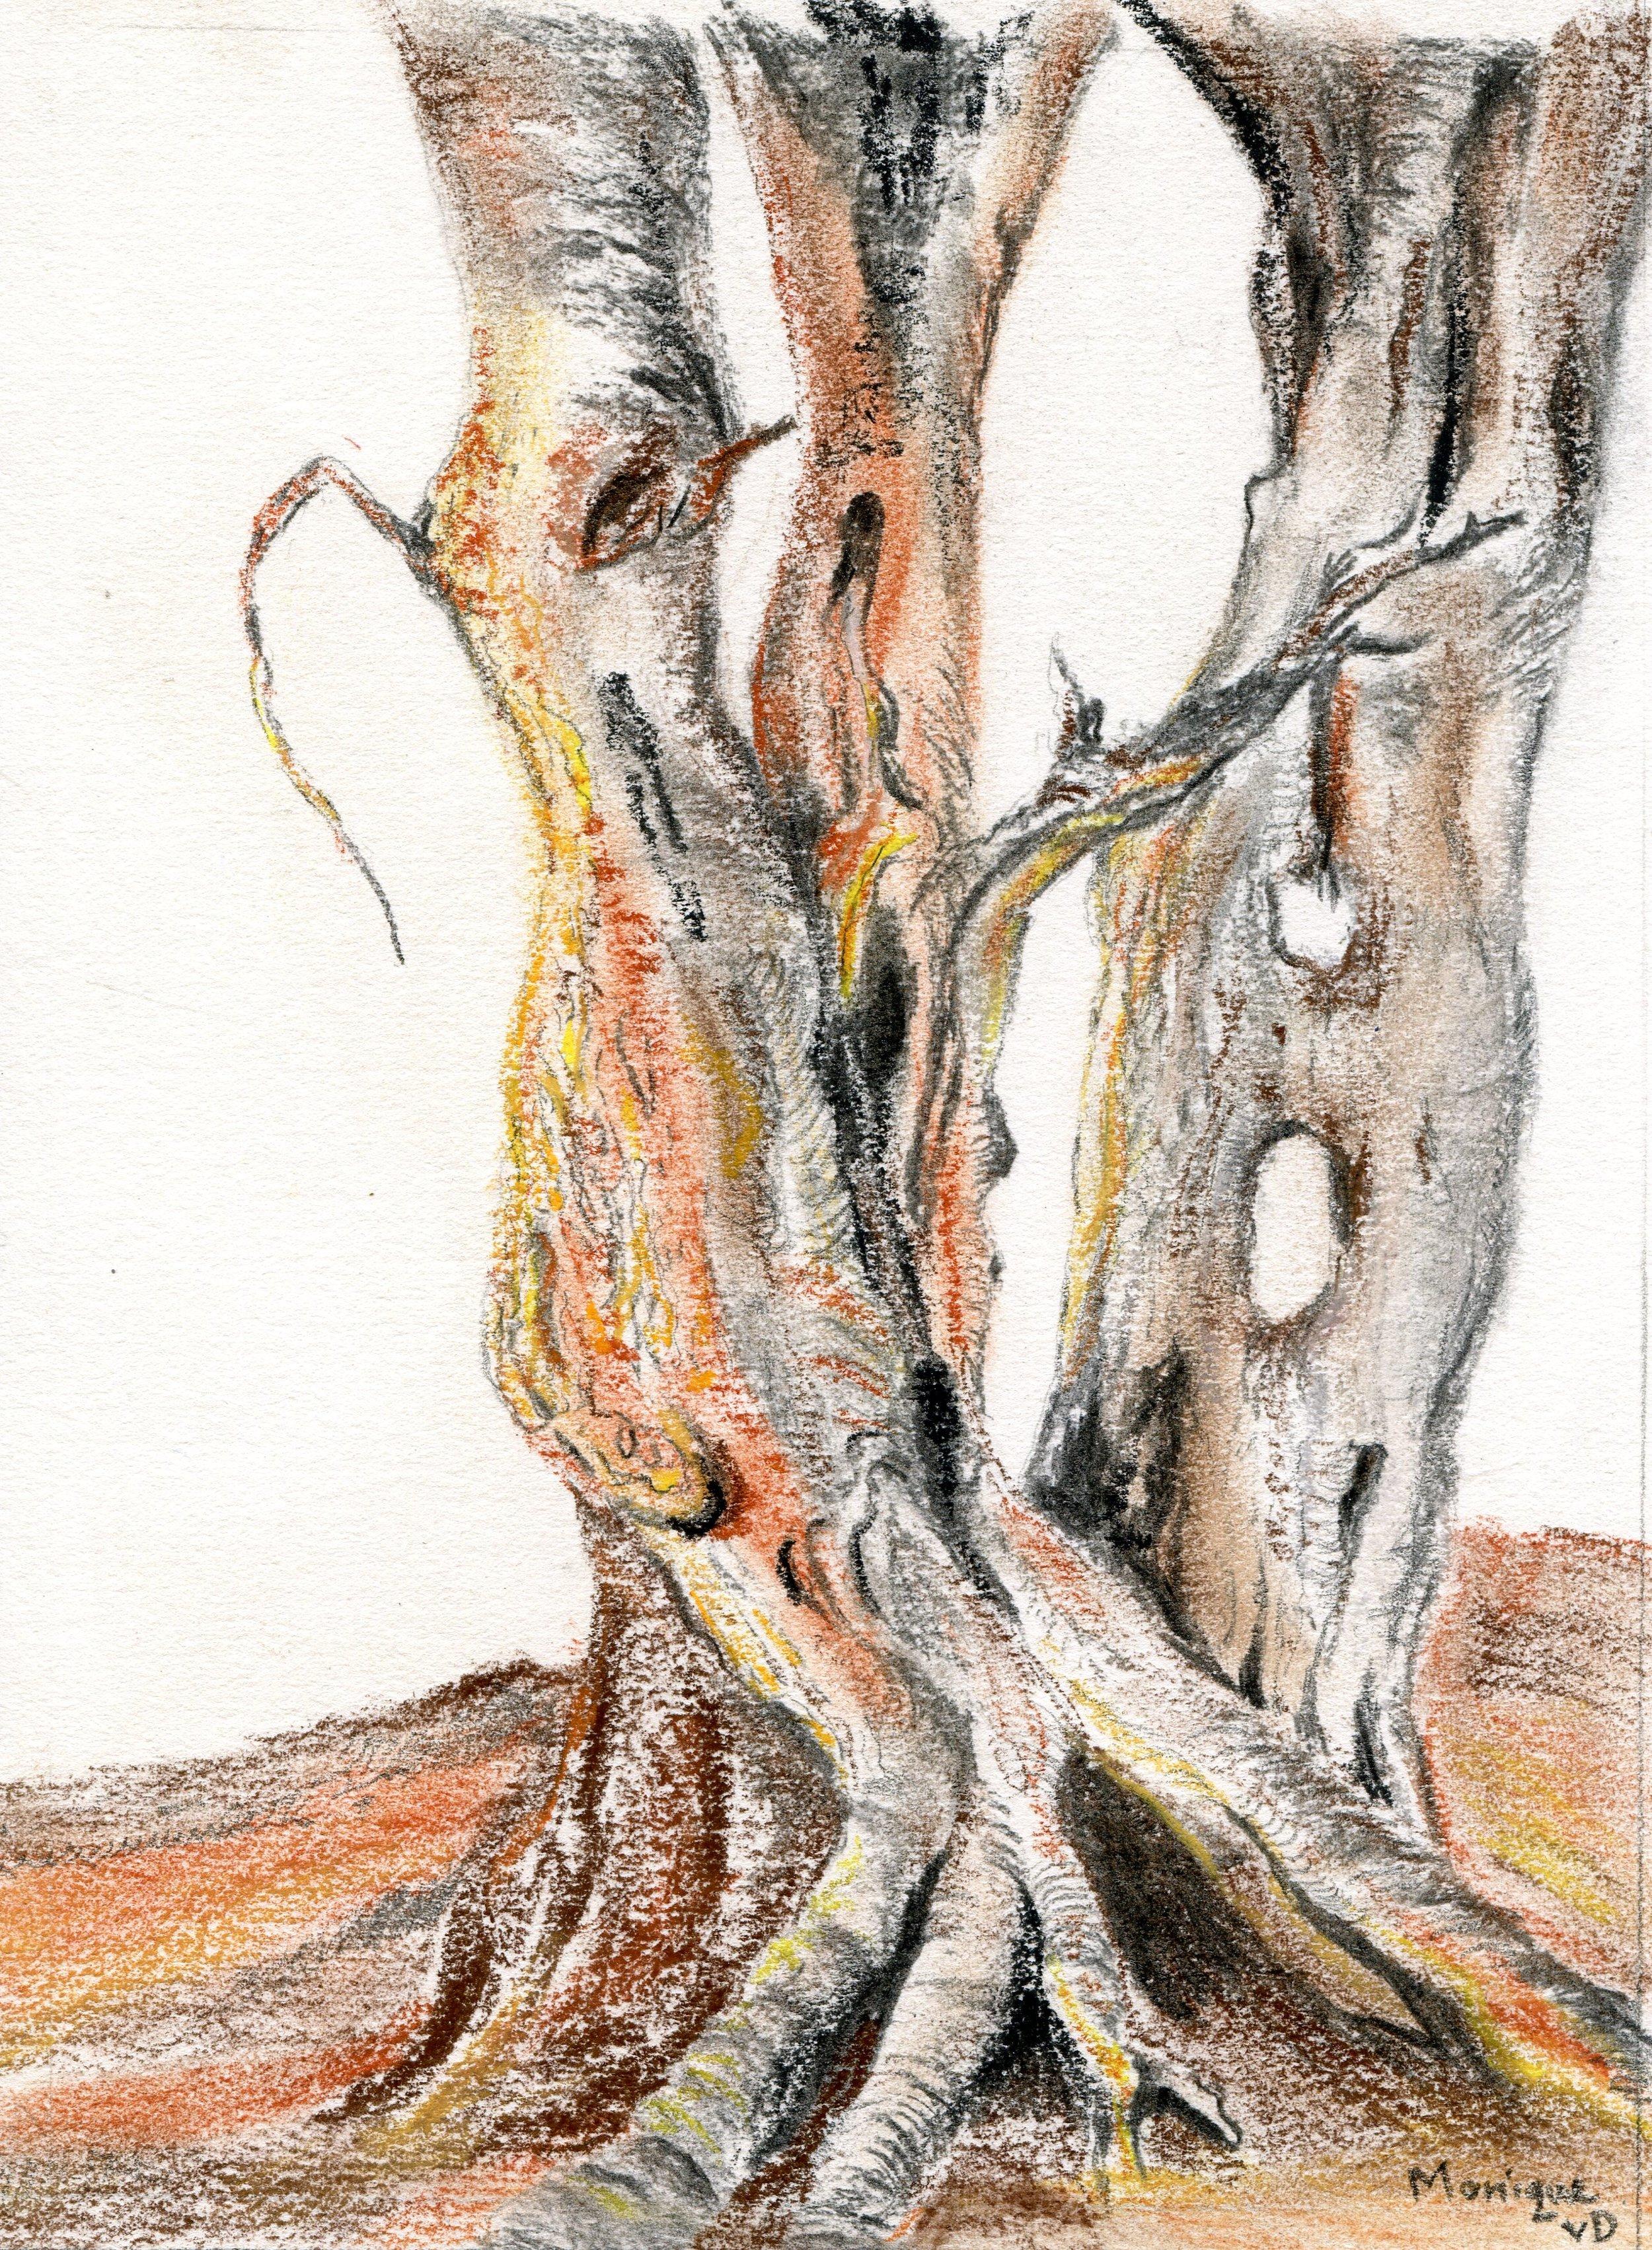 19a  Monique van Deventer  Botswana  charcoal and conte on paper